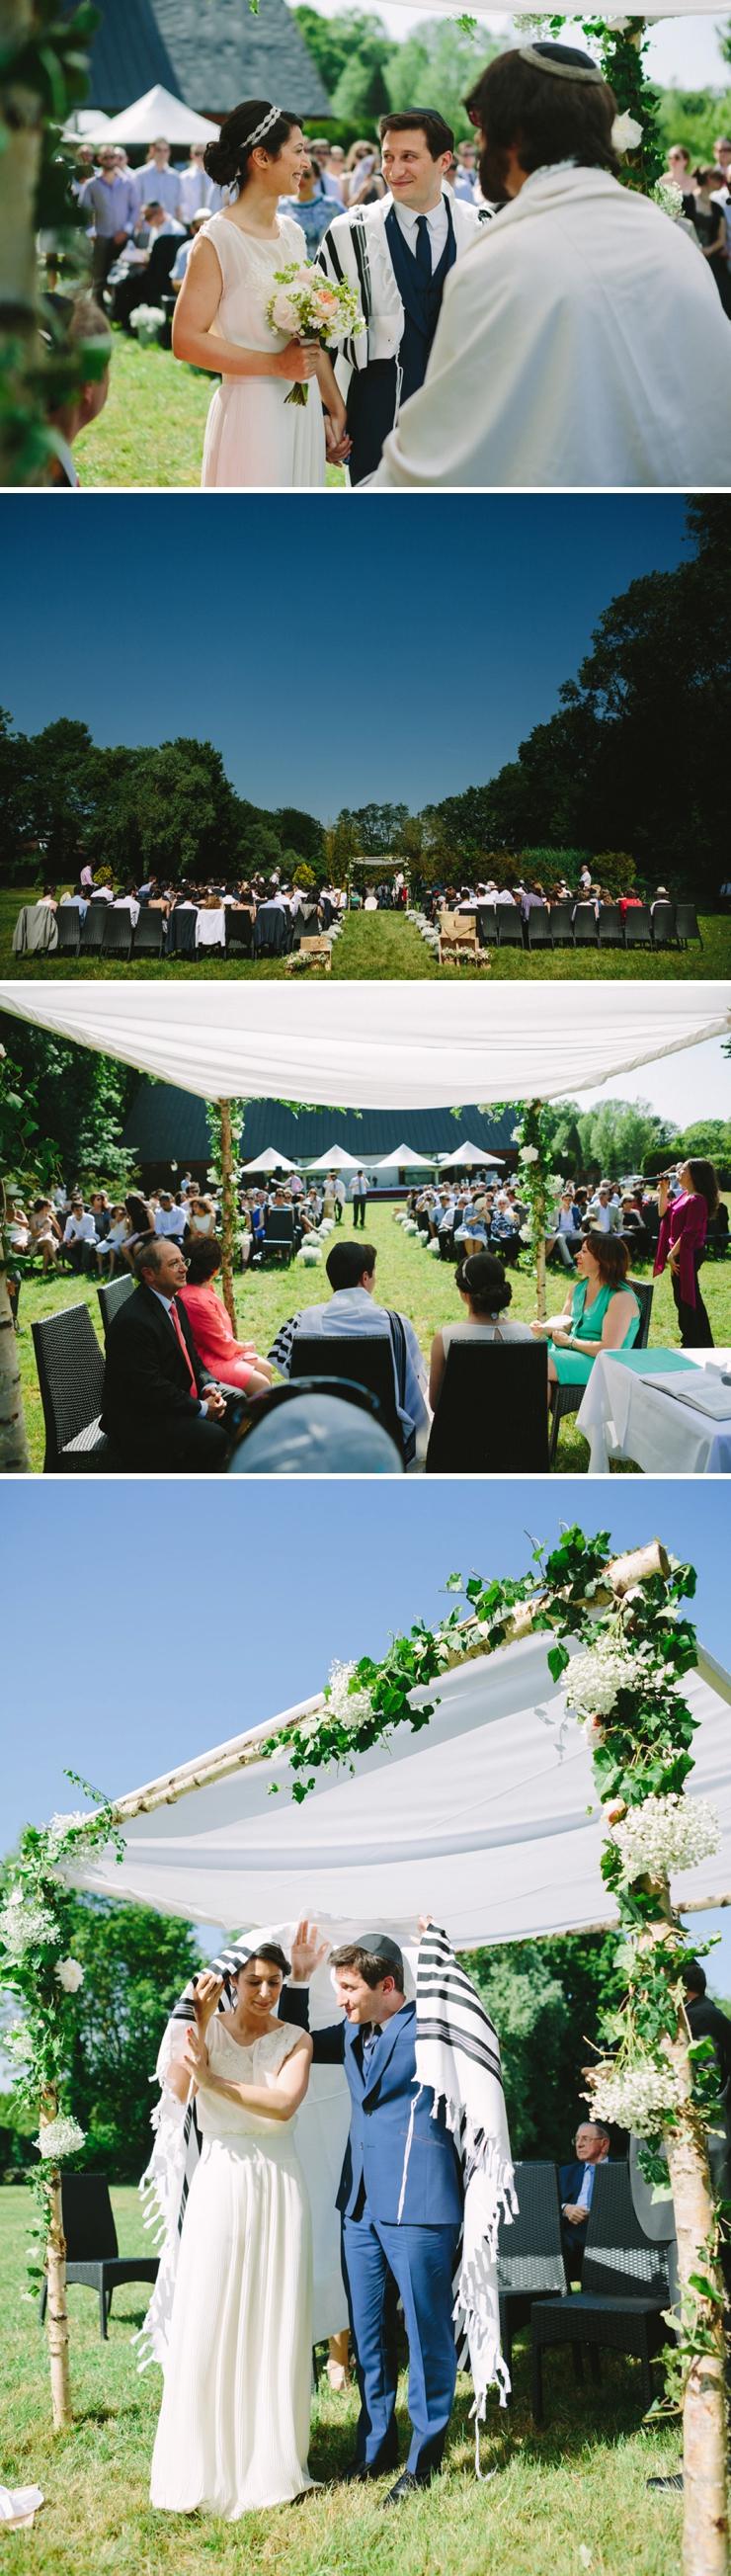 PIERRE ATELIER / http://www.pierreatelier.com / INTERNATIONAL WEDDING PHOTOGRAPHER mariage Paris france